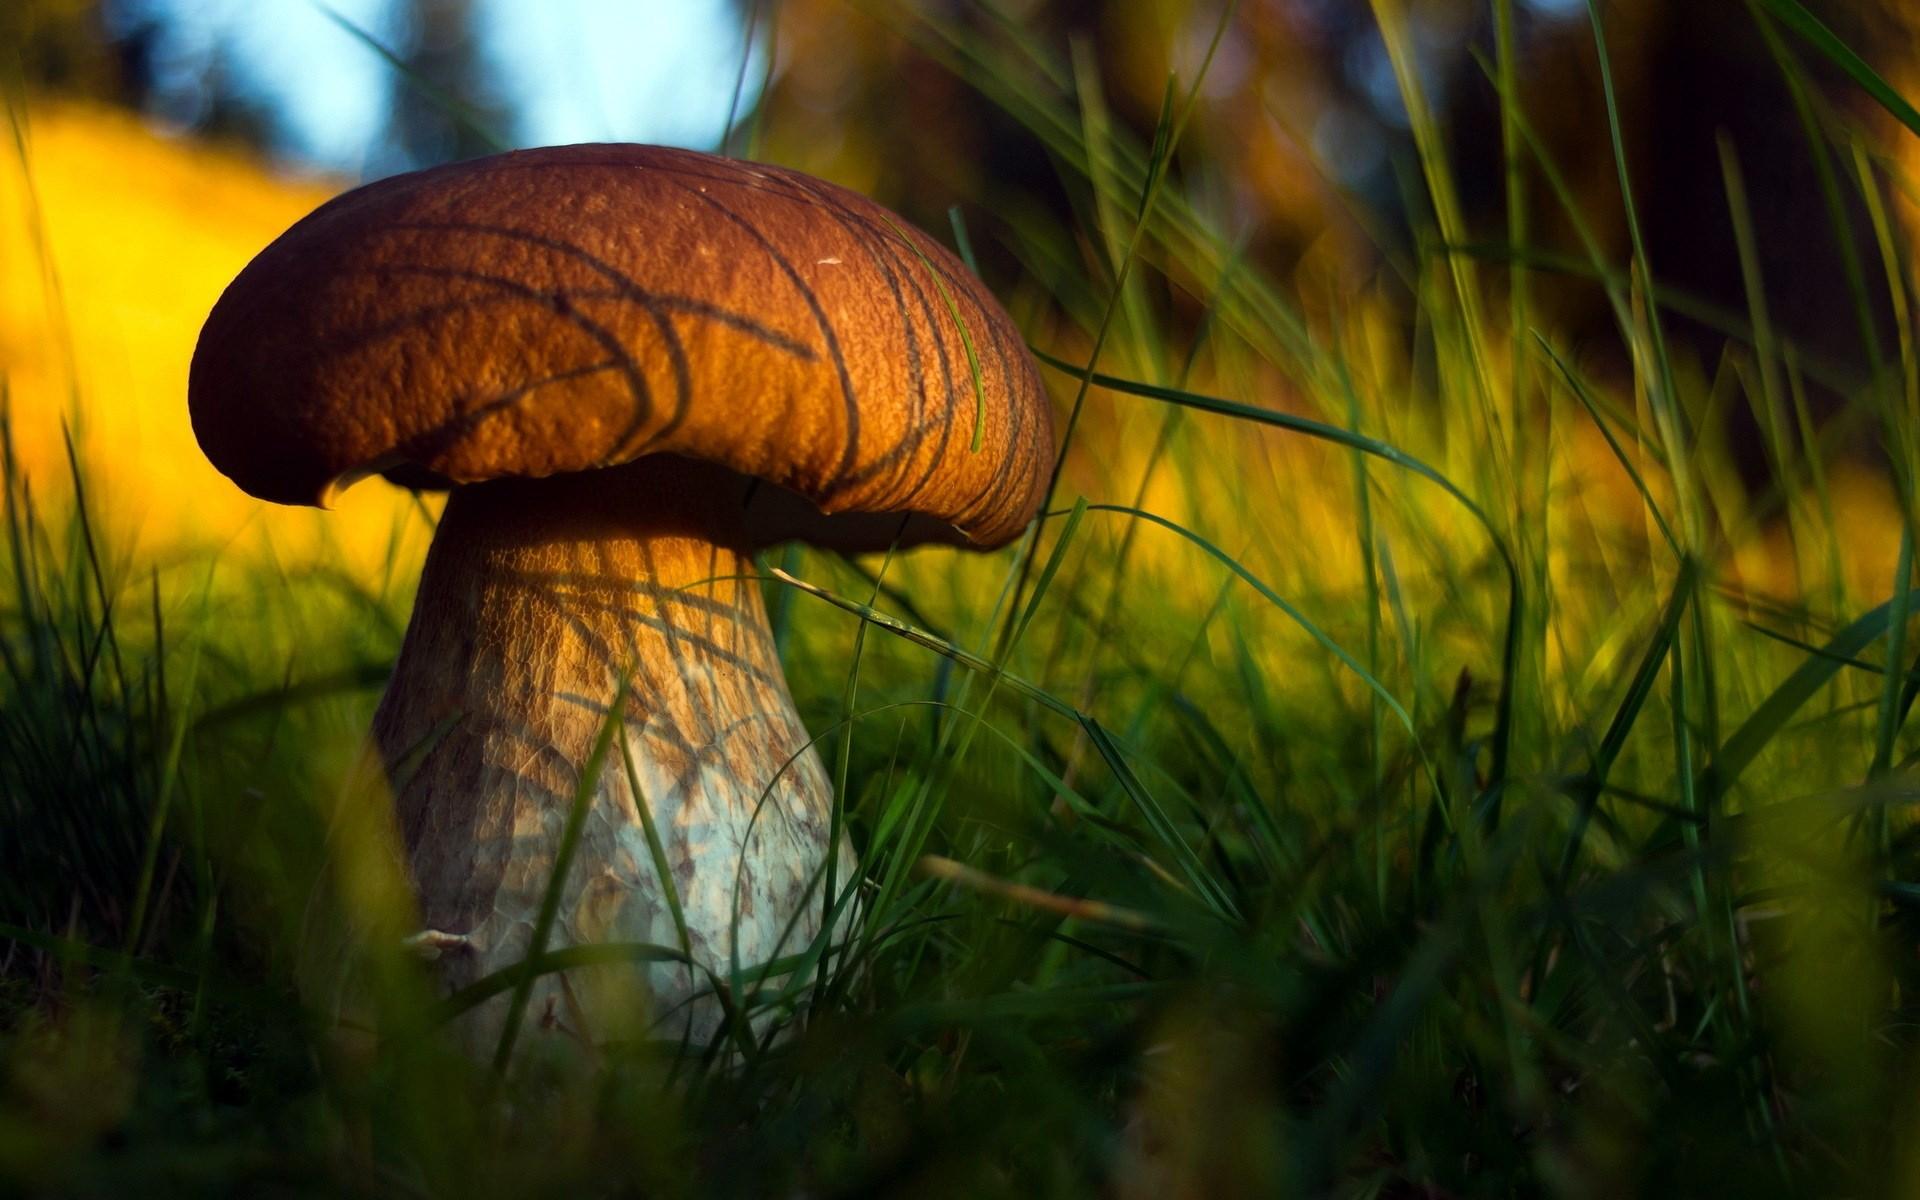 mushroom family wallpaper desktop - photo #13